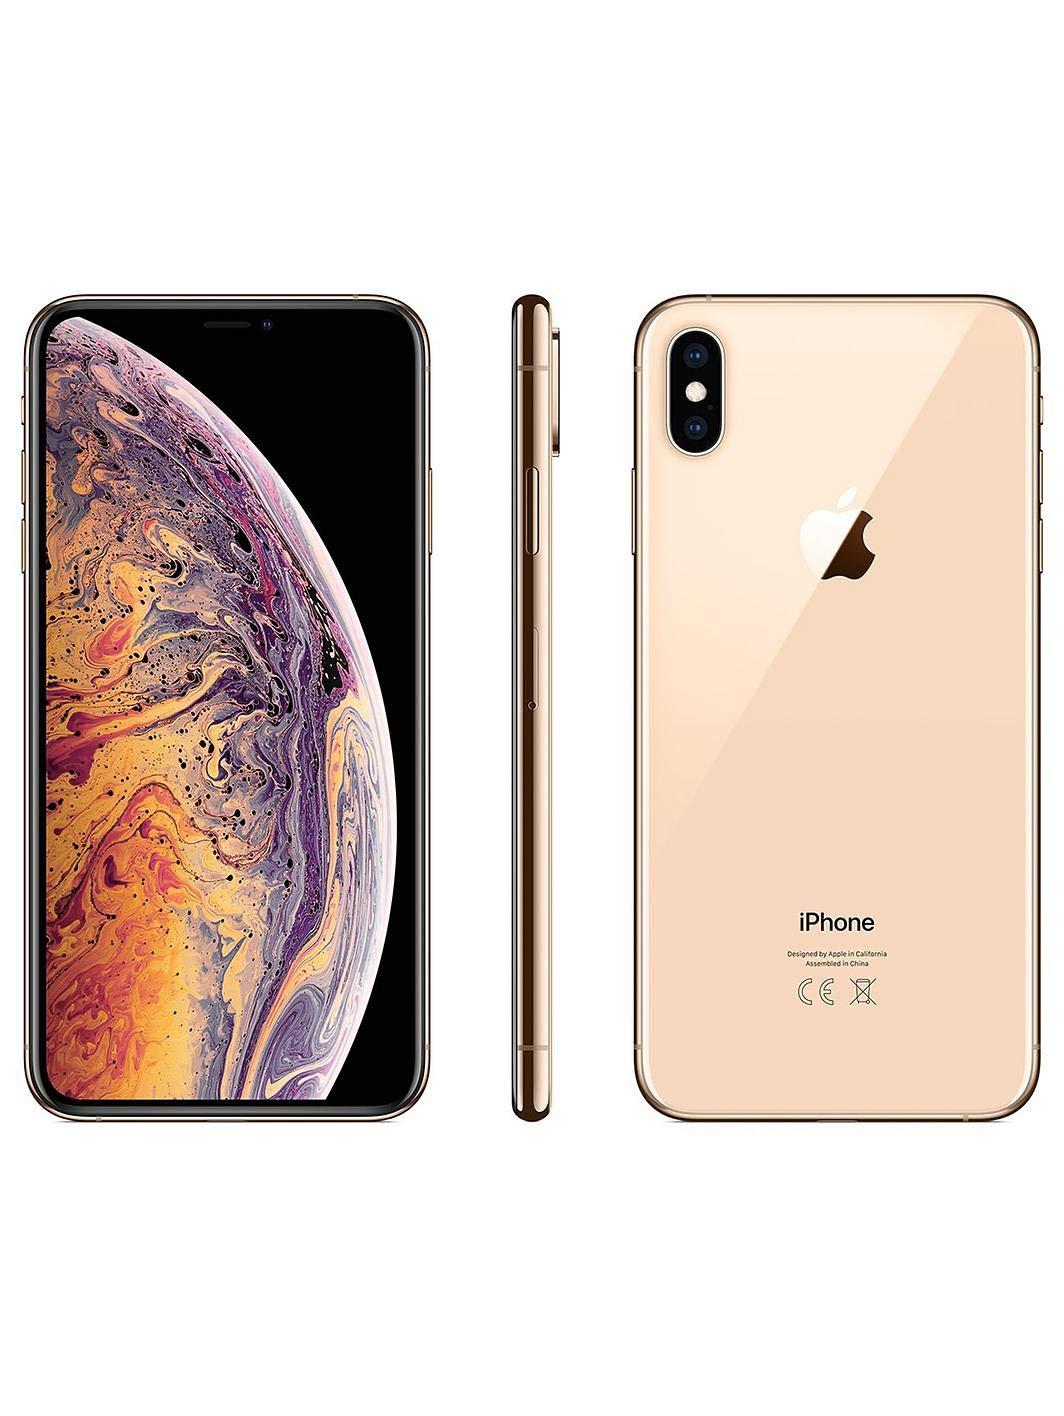 Apple iPhone XS (64GB): 100GB Data - £39.99 p/m, £249.99 upfront cost